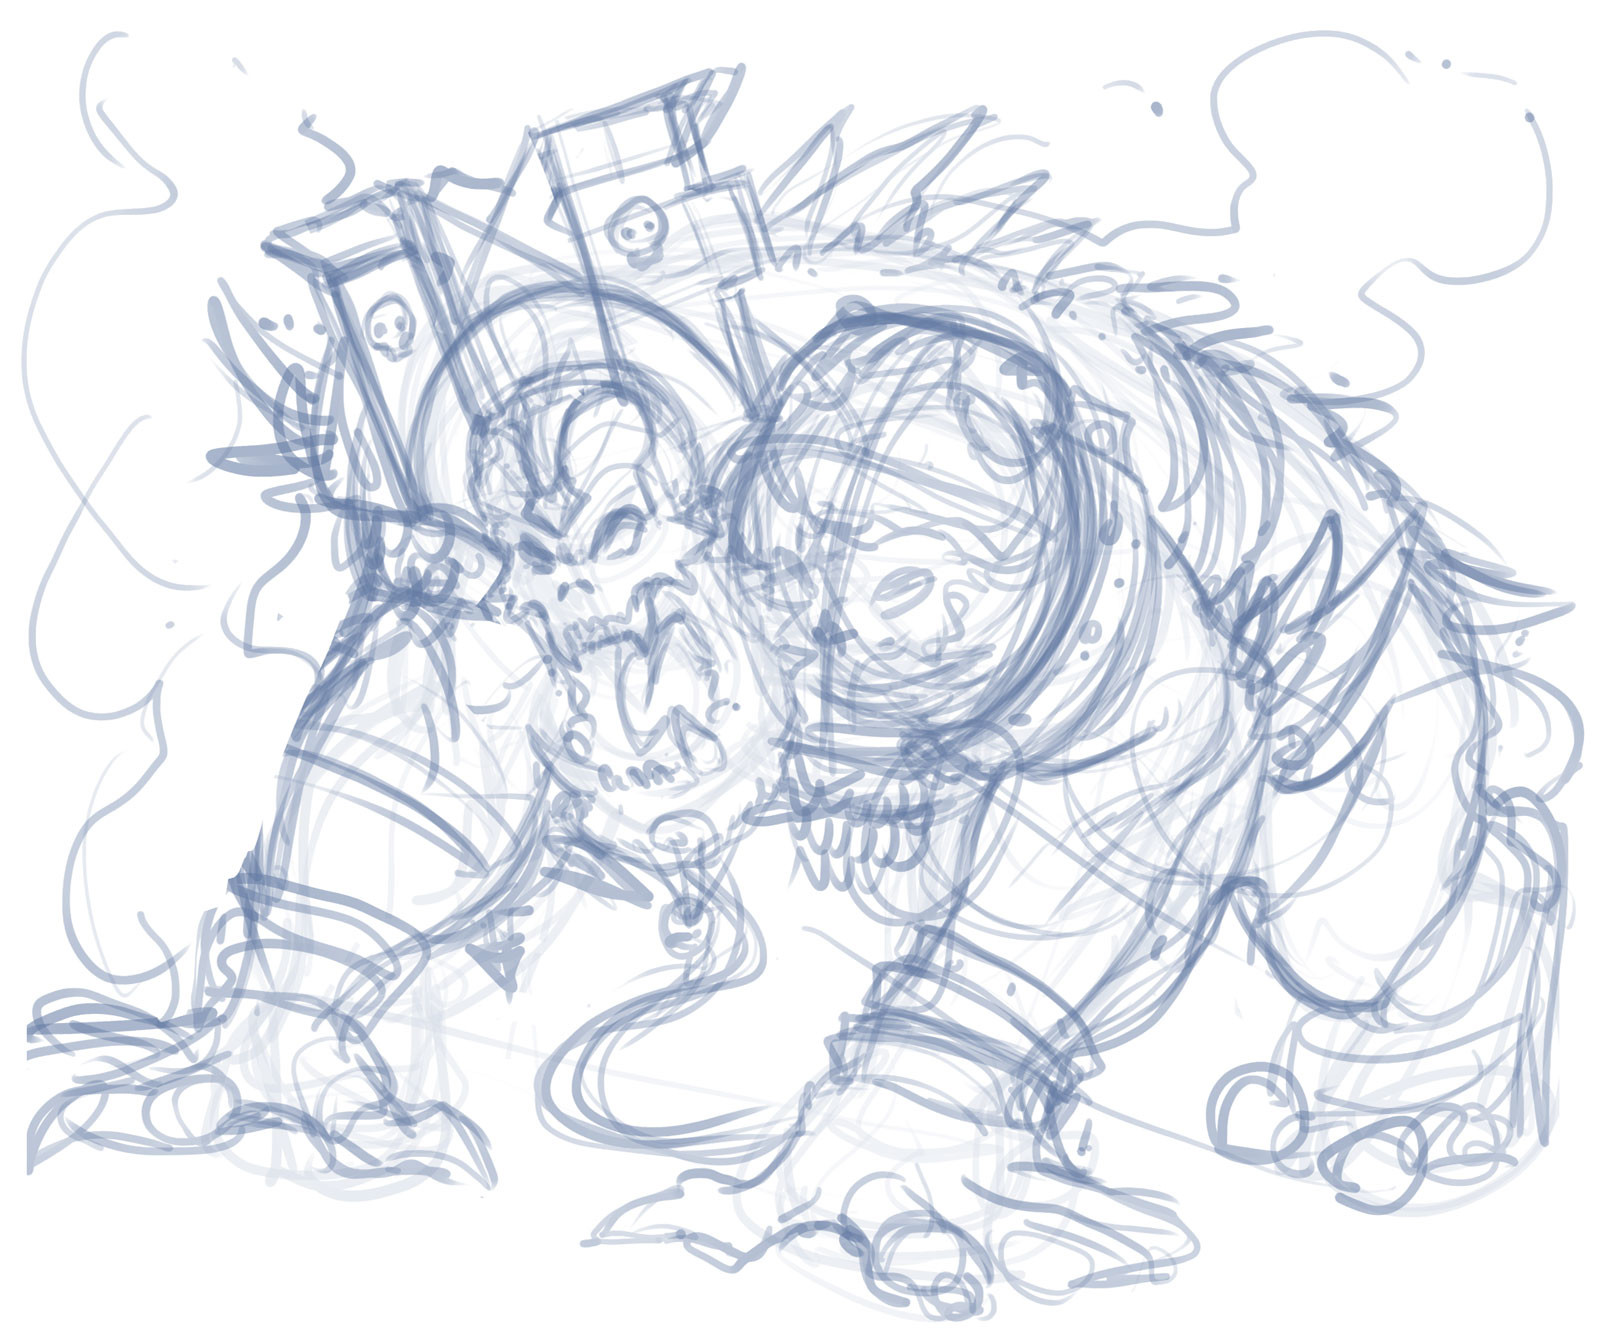 Rafael teruel cosmos quest world boss air by rafater rough sketch